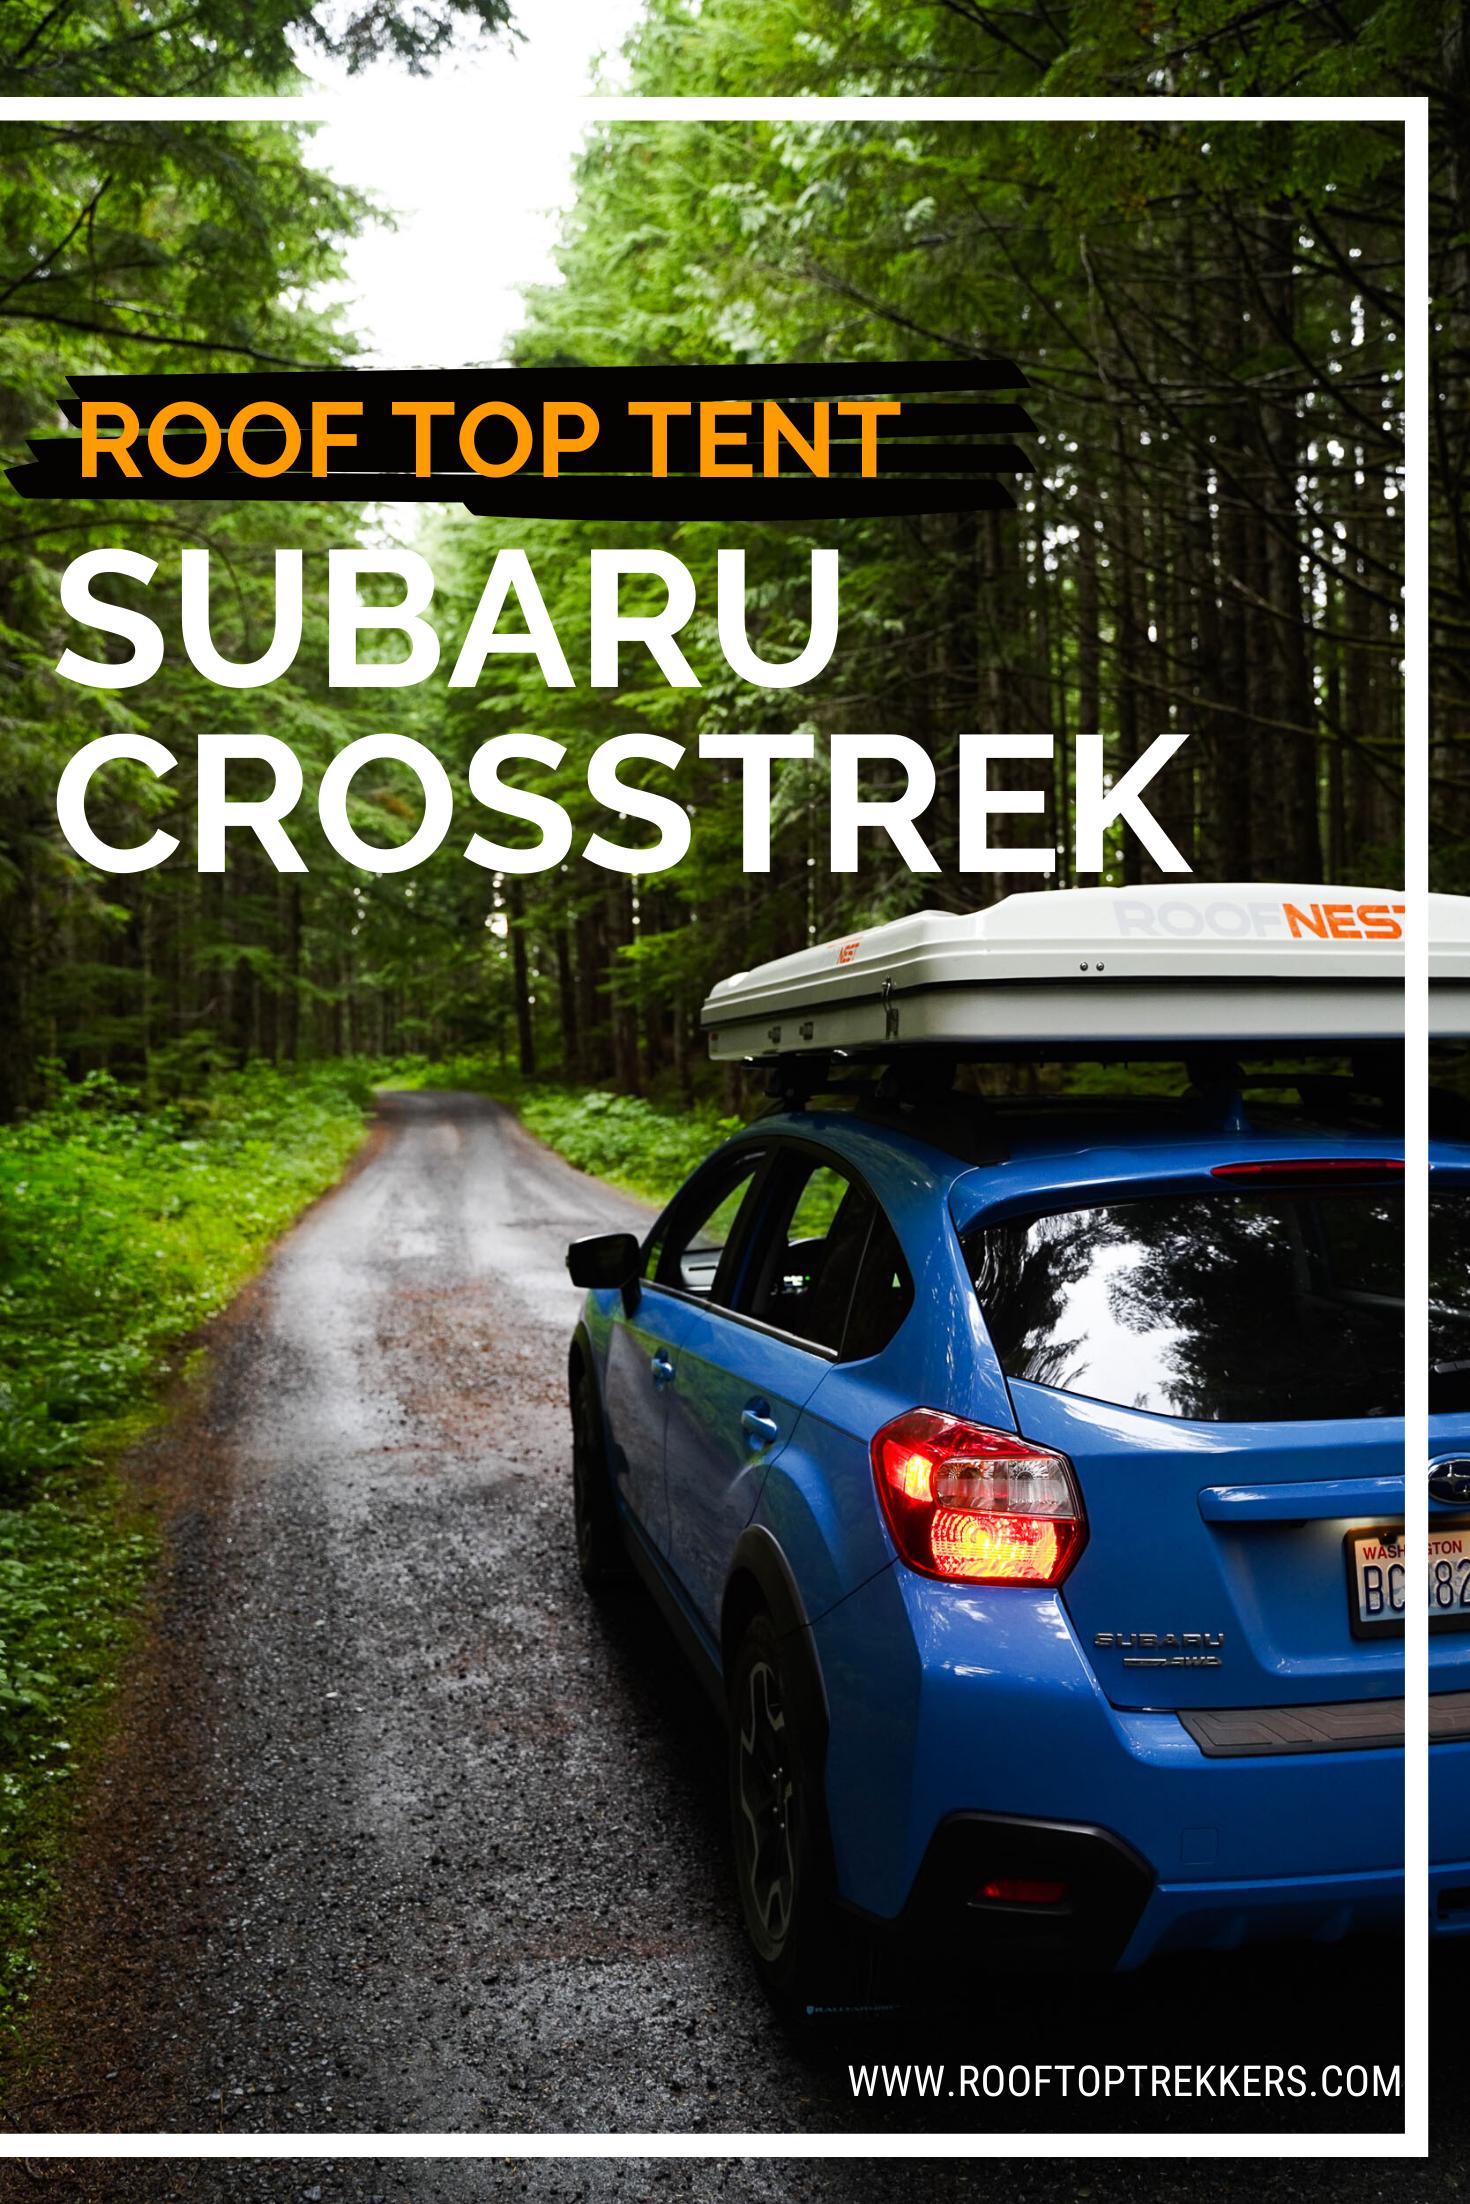 Roof Top Tent Set Up Subaru Crosstrek Top Tents Roof Top Tent Tent Camping